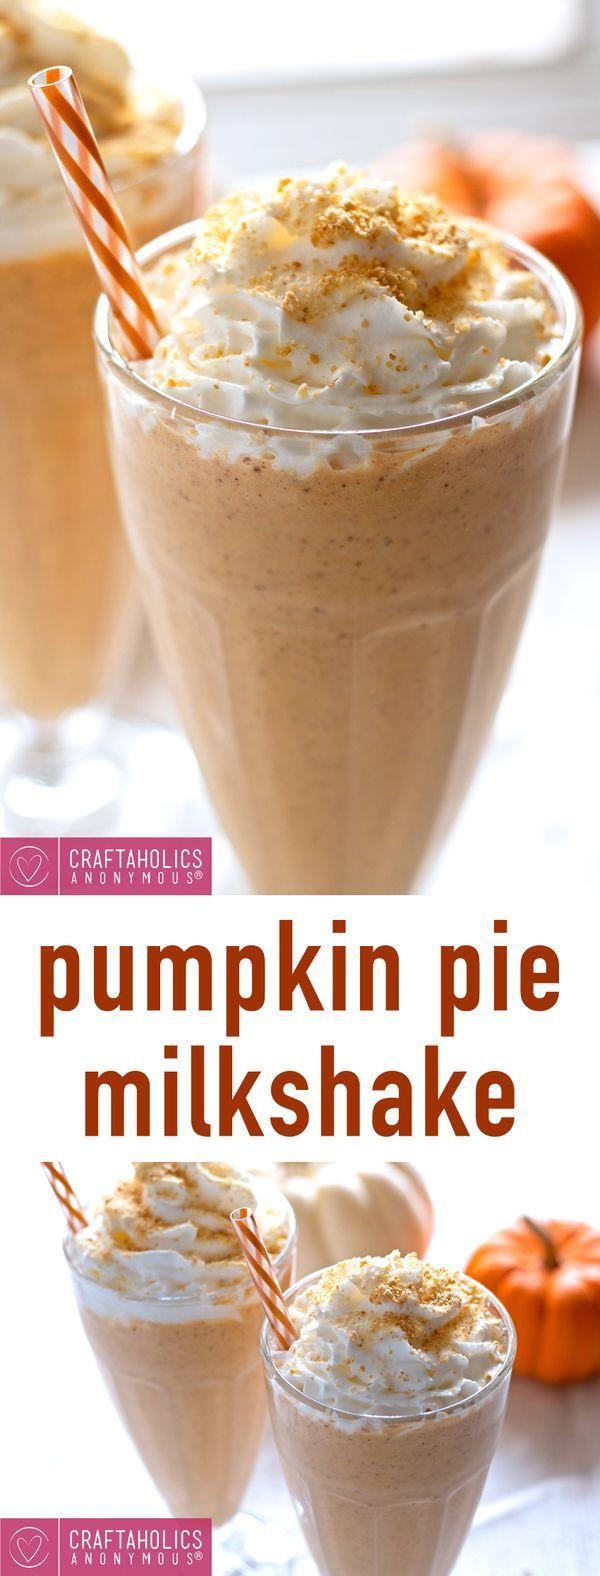 ... + Milkshake Recipes on Pinterest | Milk shakes, Milkshakes and Shake